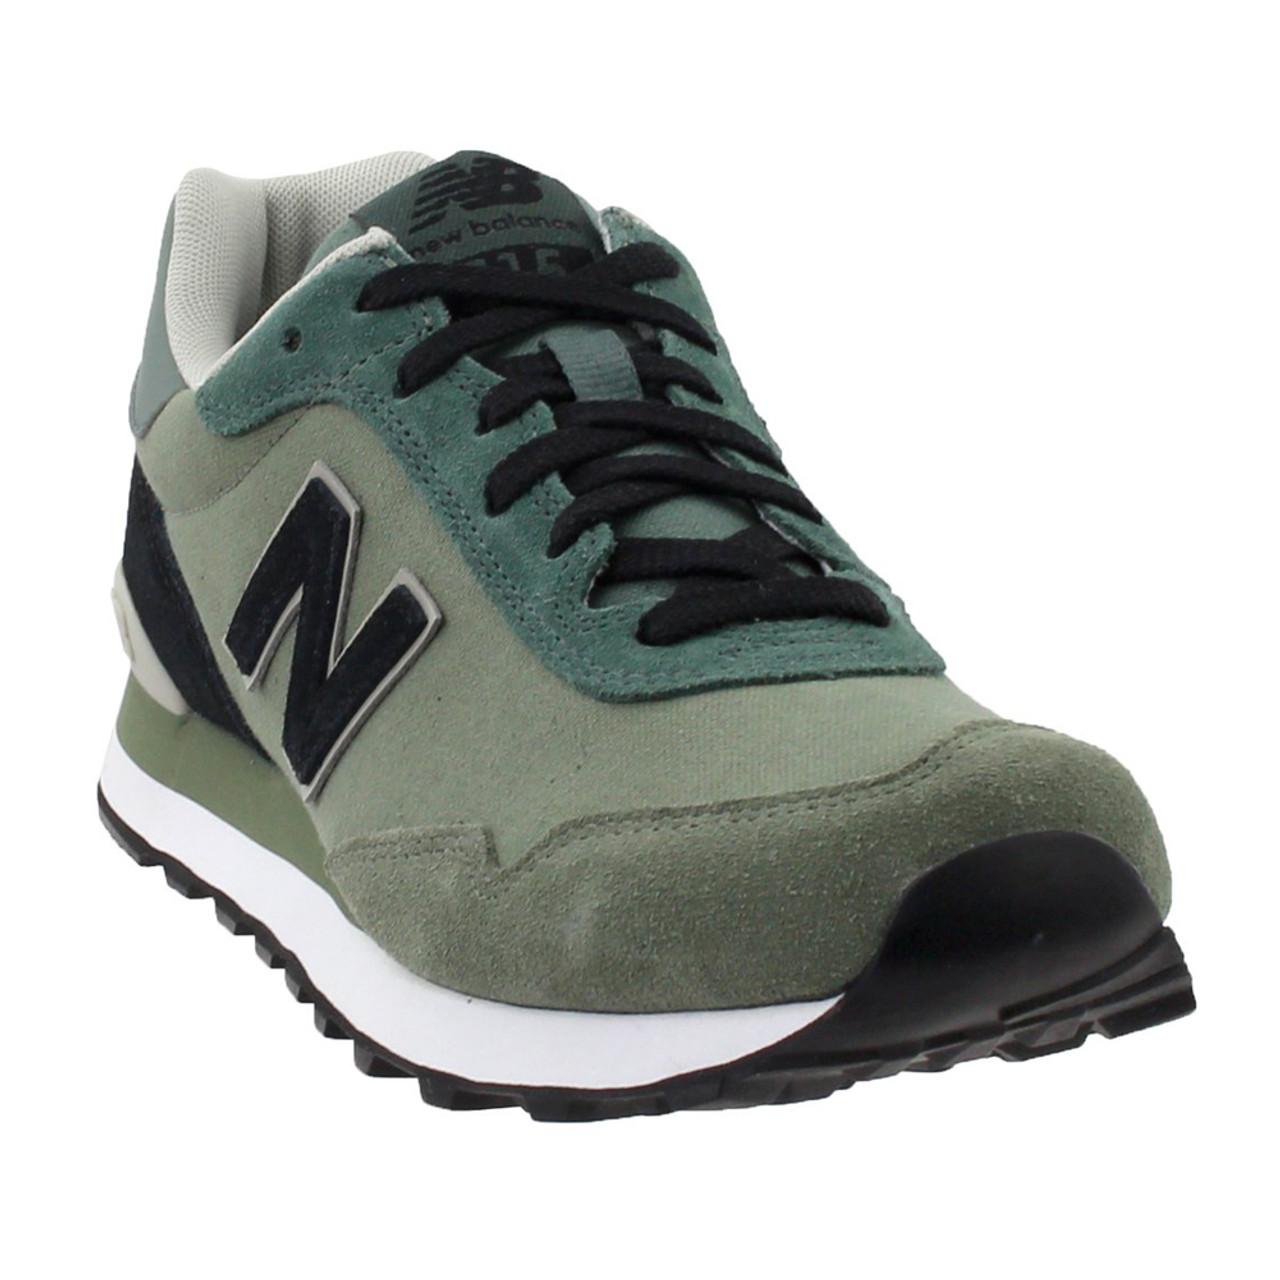 bca1512b55297 New Balance Men's ML515CGS Sneaker Green/Black - Shop now @ Shoolu.com